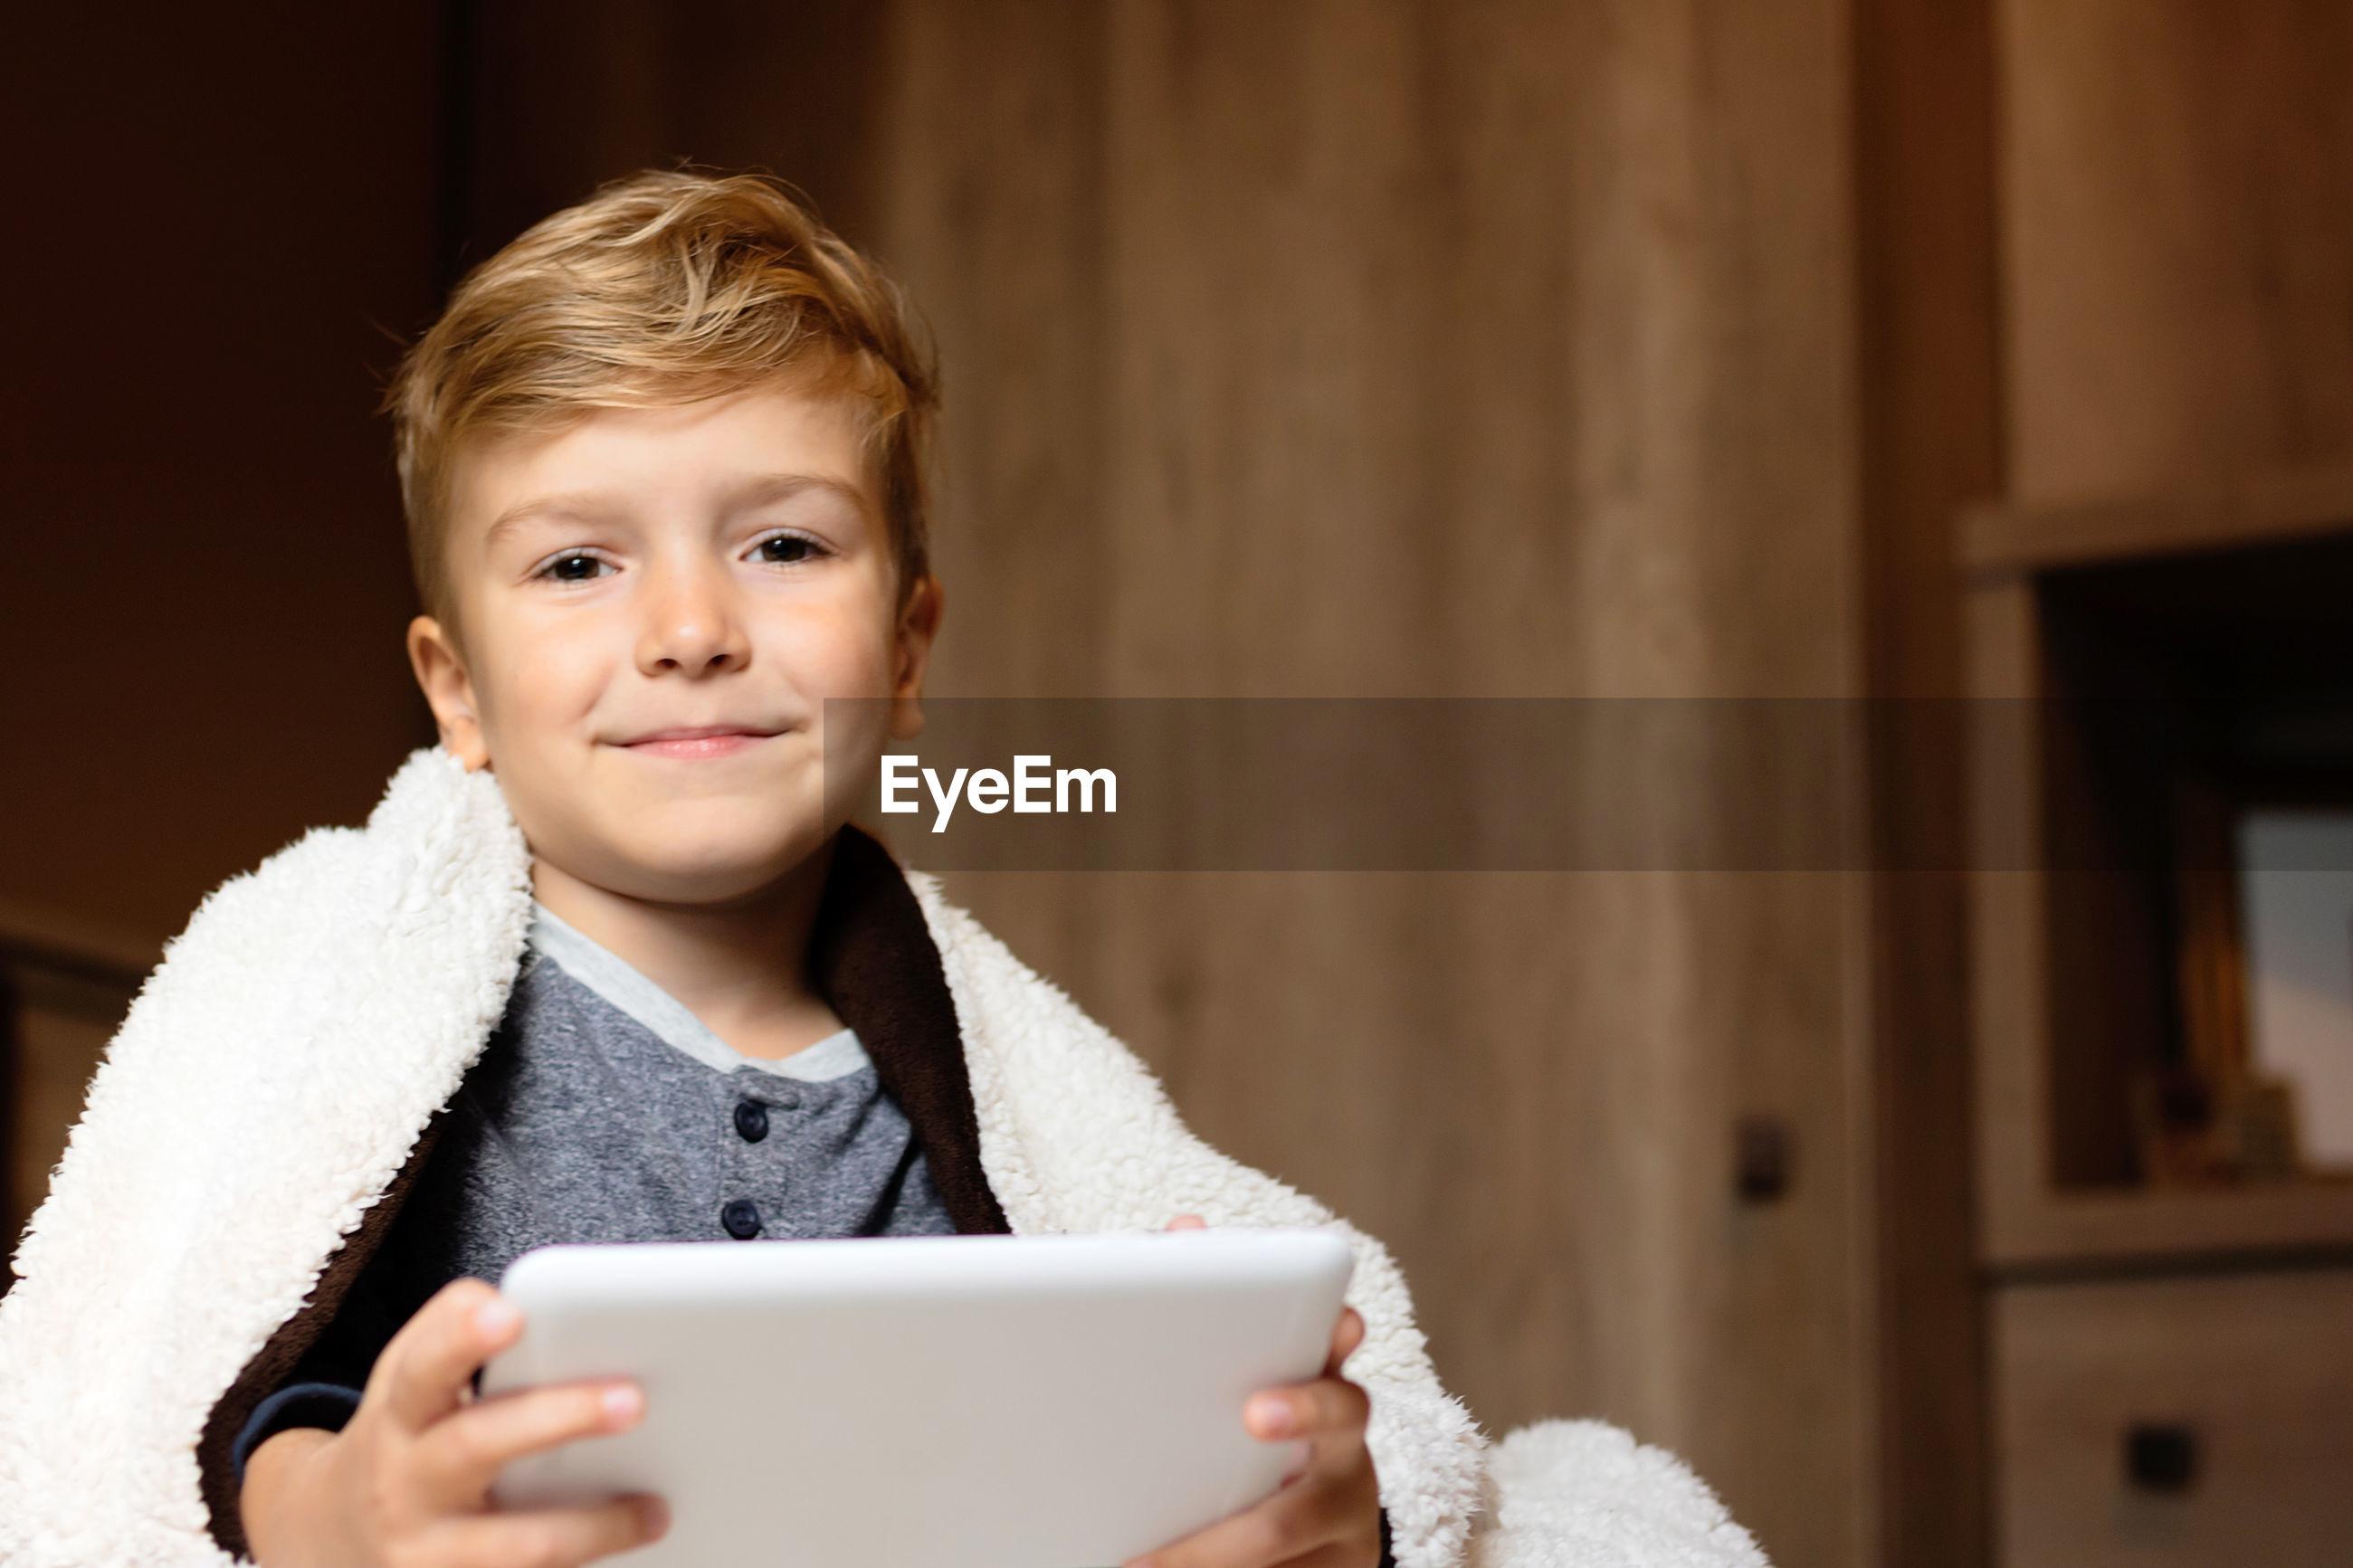 PORTRAIT OF SMILING BOY HOLDING SMART PHONE